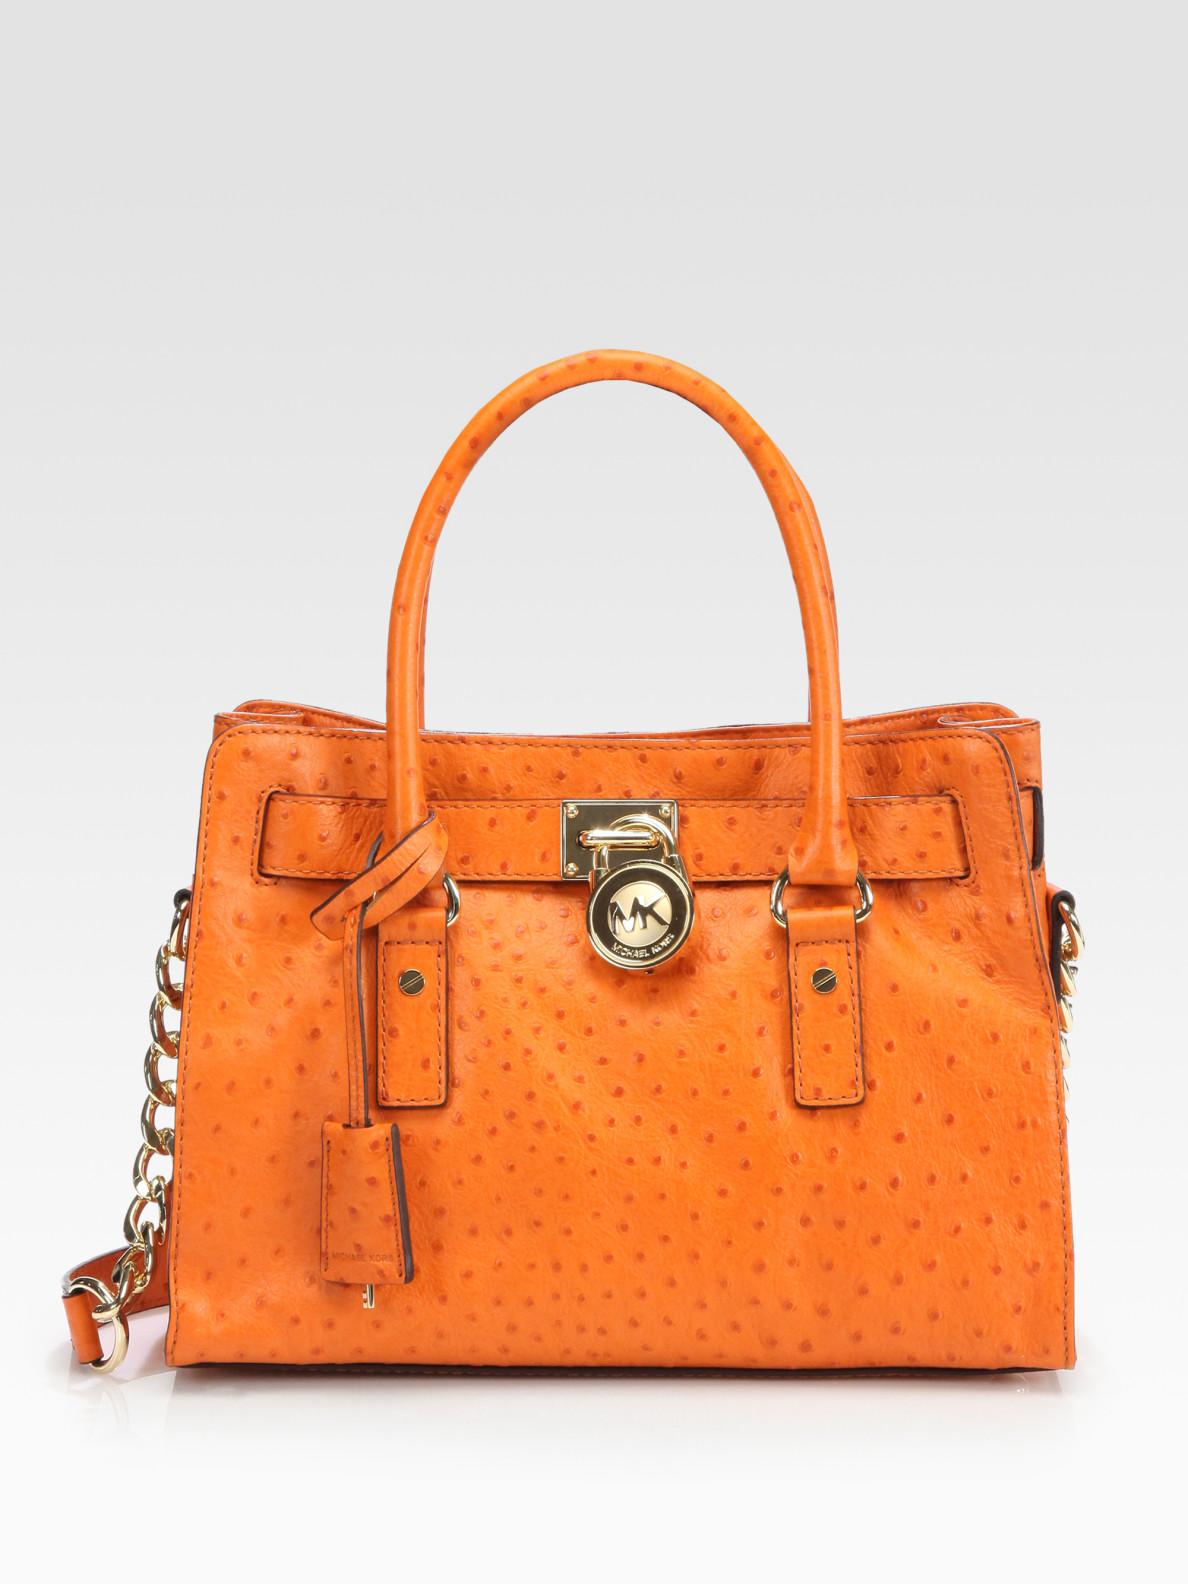 1da0a7326263 Lyst - MICHAEL Michael Kors Hamilton Ostrich-Stamped Leather Satchel ...